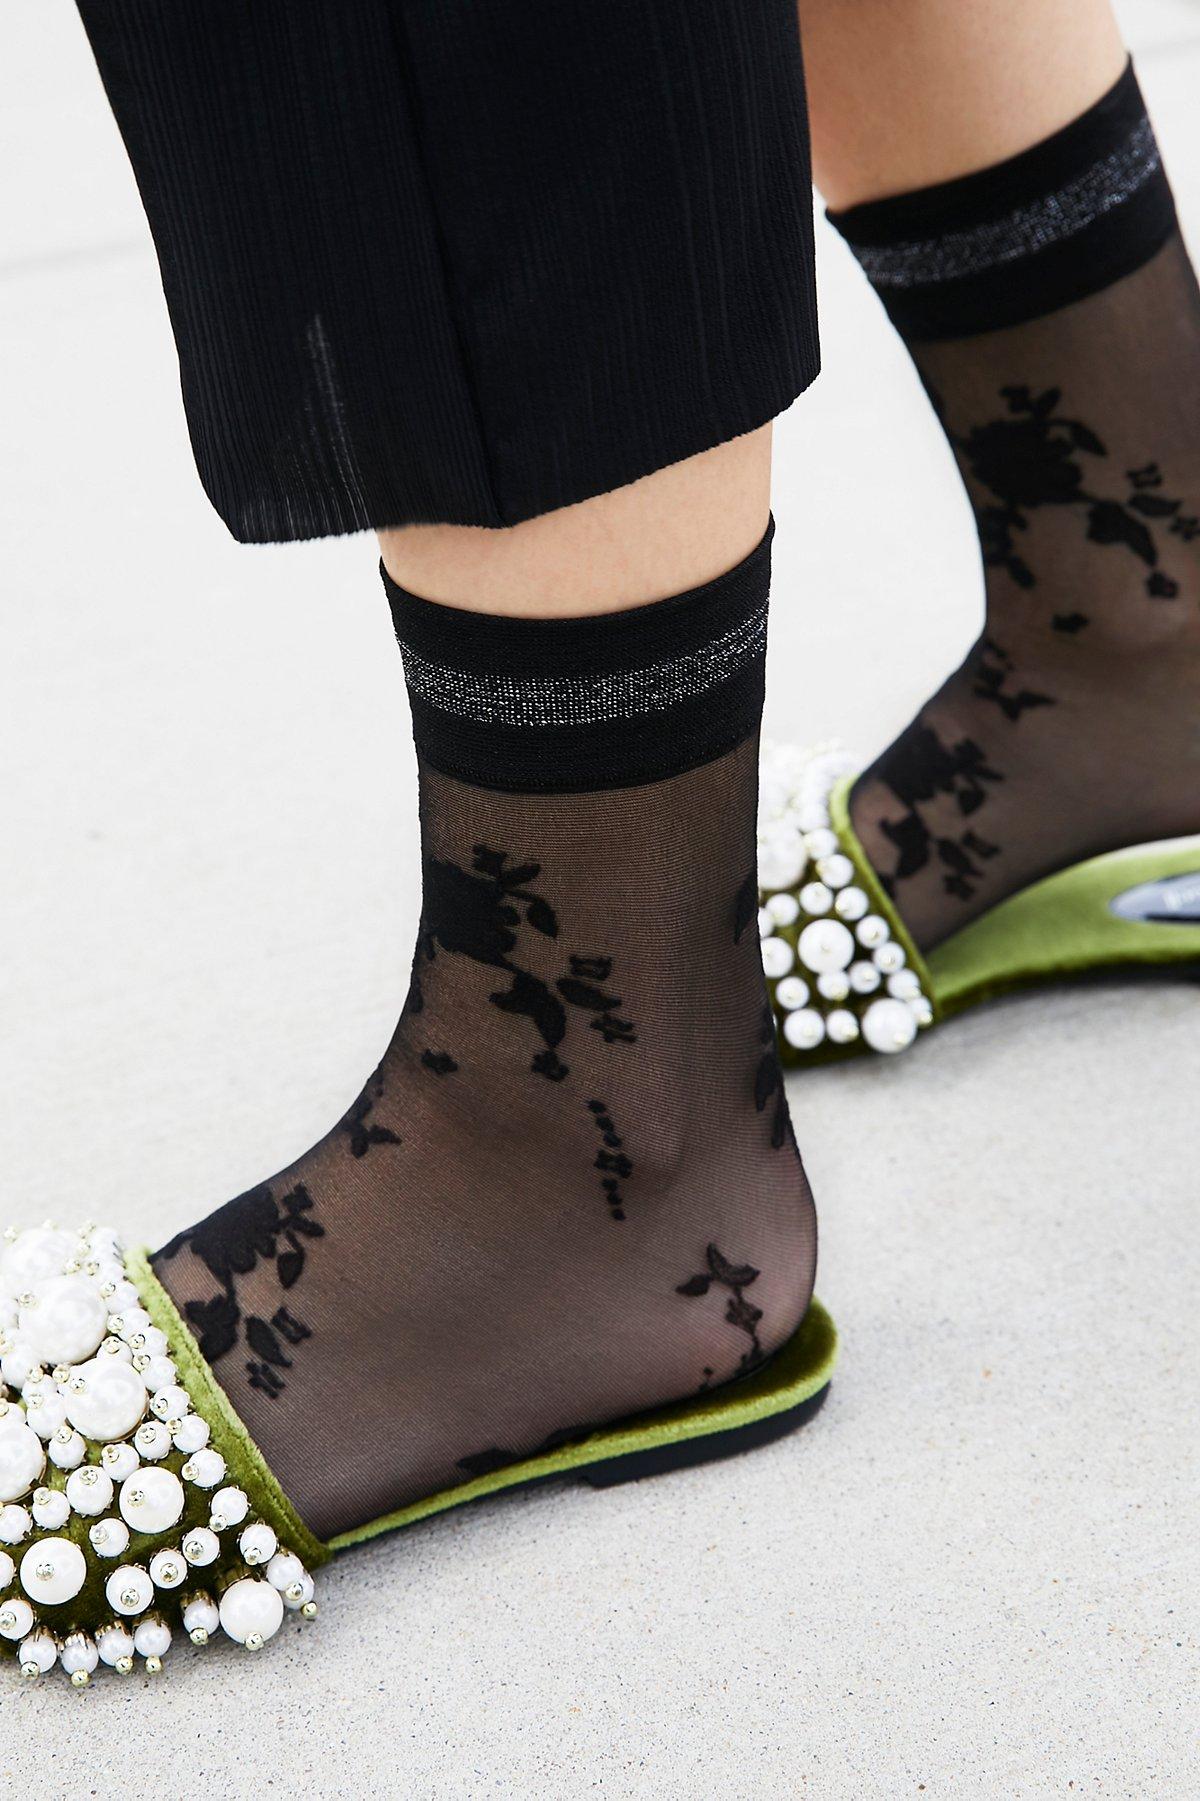 Mariposa花卉运动短袜